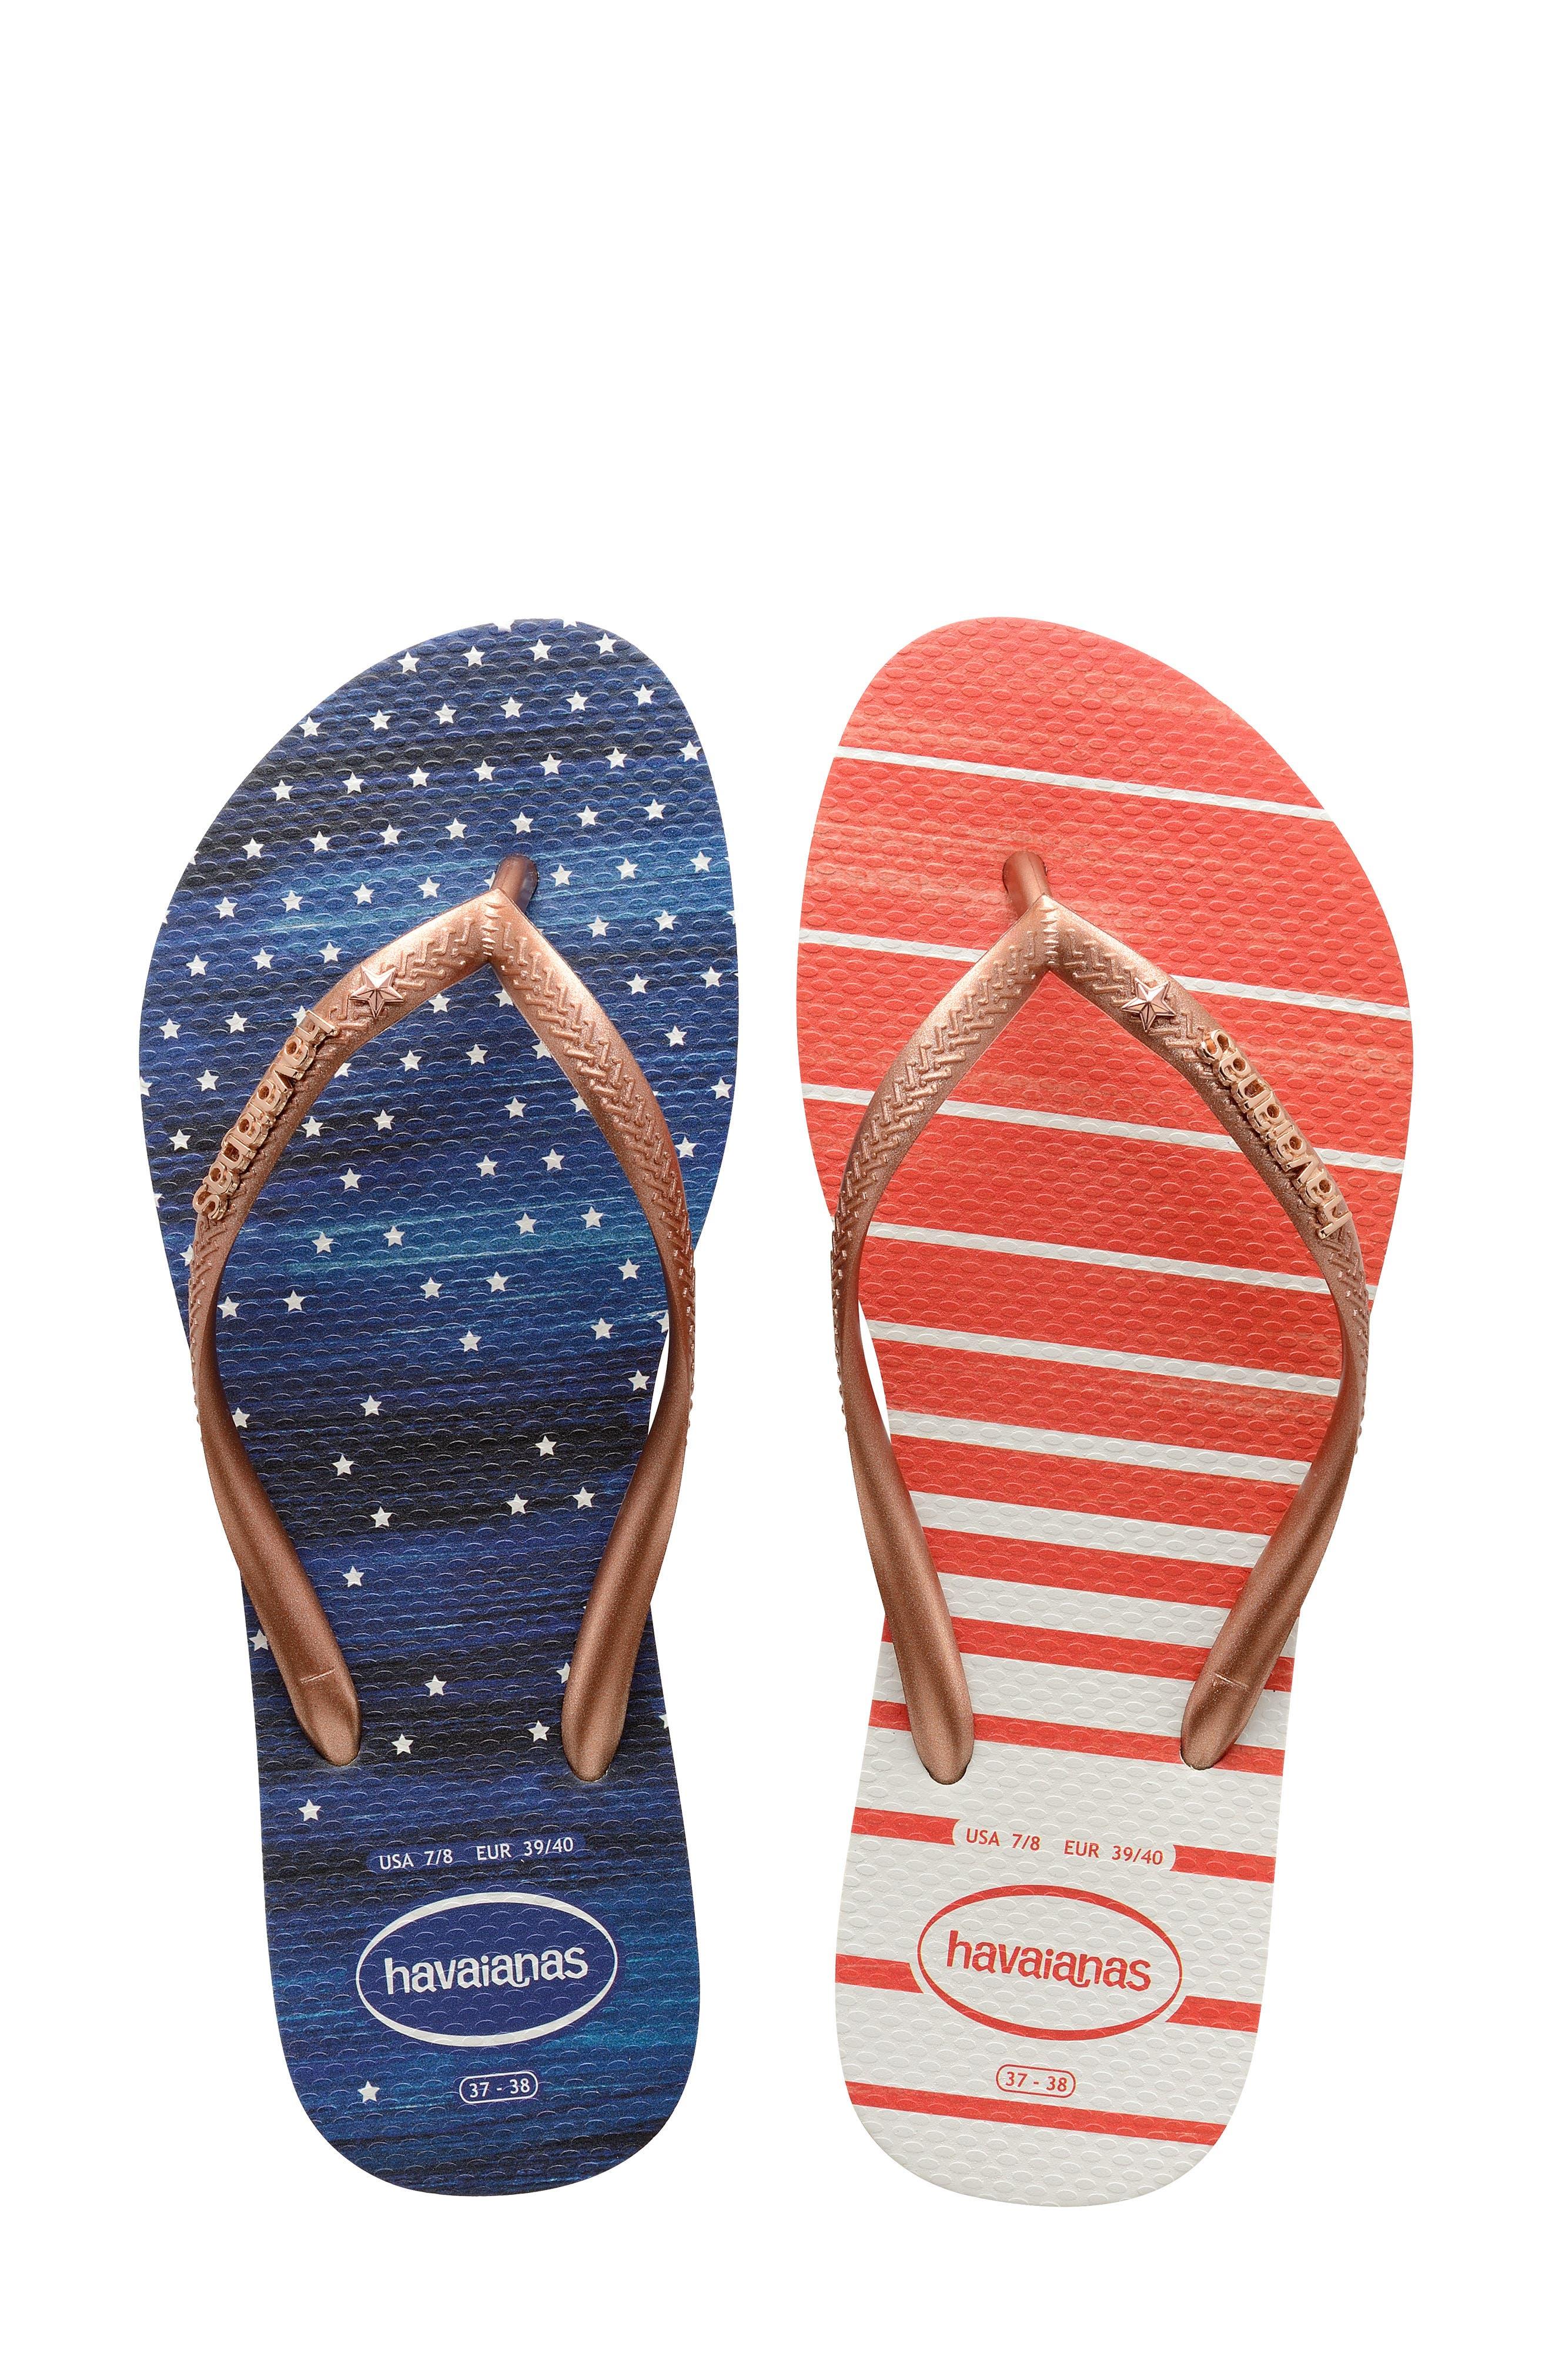 e3ac32dbe497 Women s Flip Flops New Arrivals  Clothing